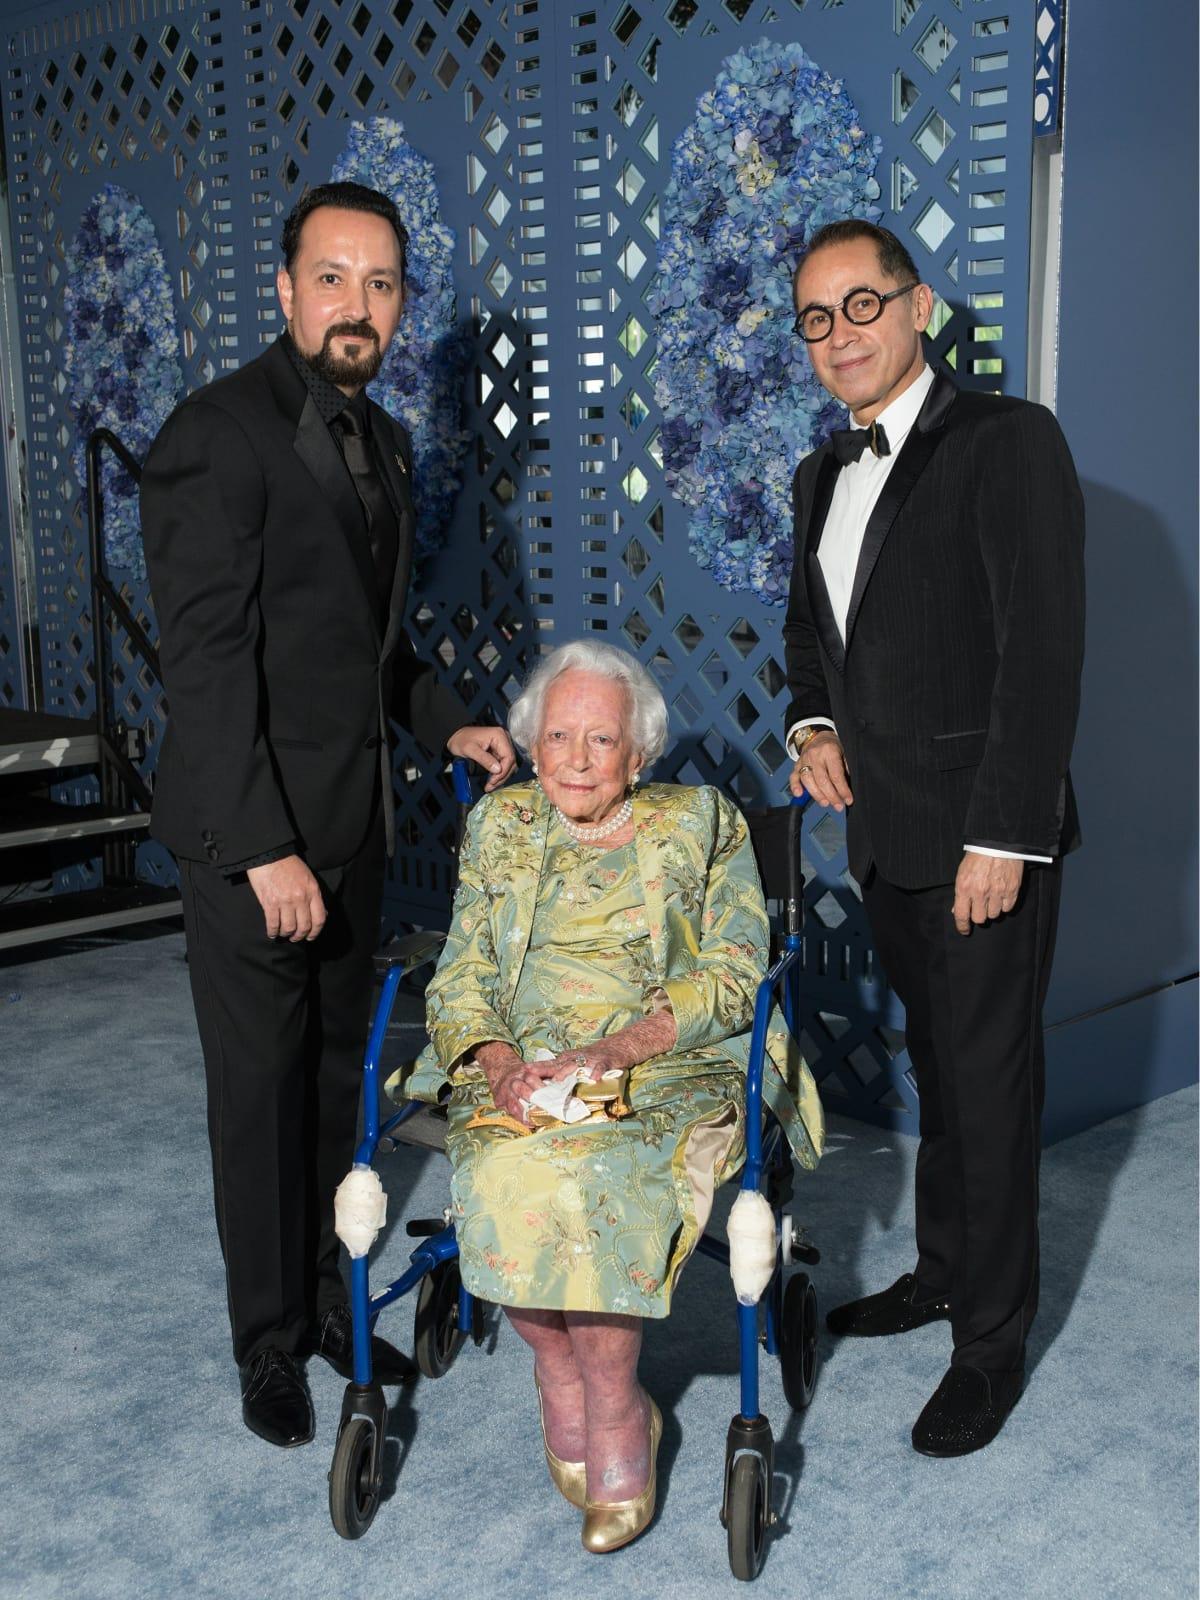 Carlos Gonzalez-Jaime, Margaret McDermott, Agustín Arteaga